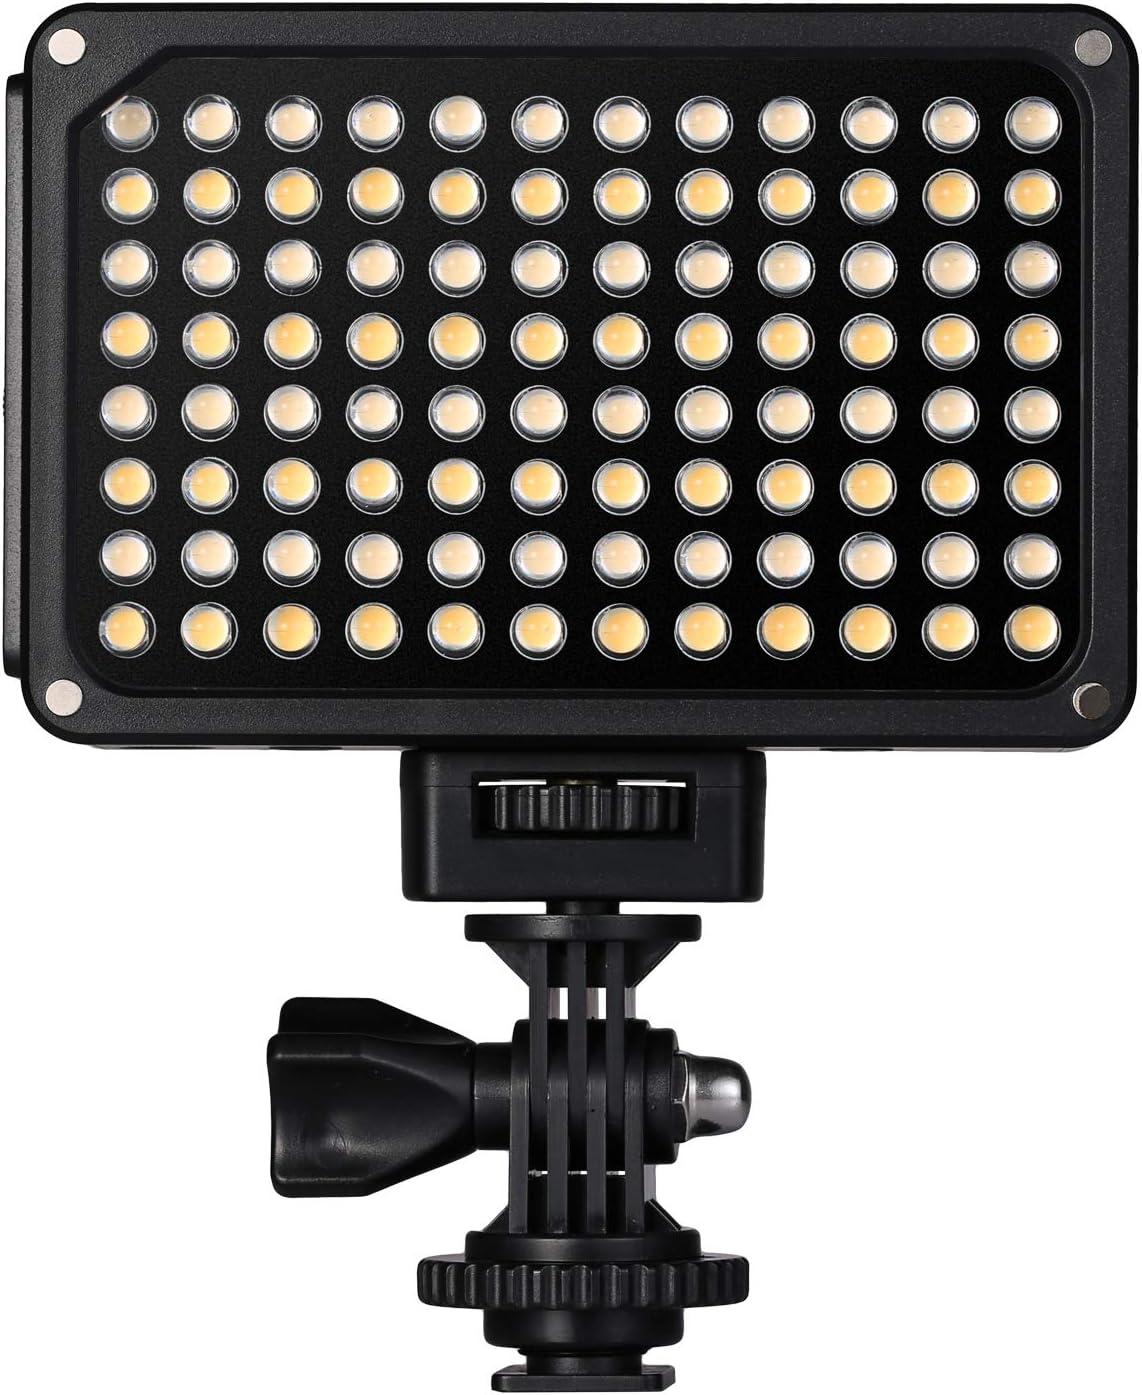 GVM LED on Cheap bargain High order Camera Video Light Bi-Color with CRI97 + 3200K-5600K